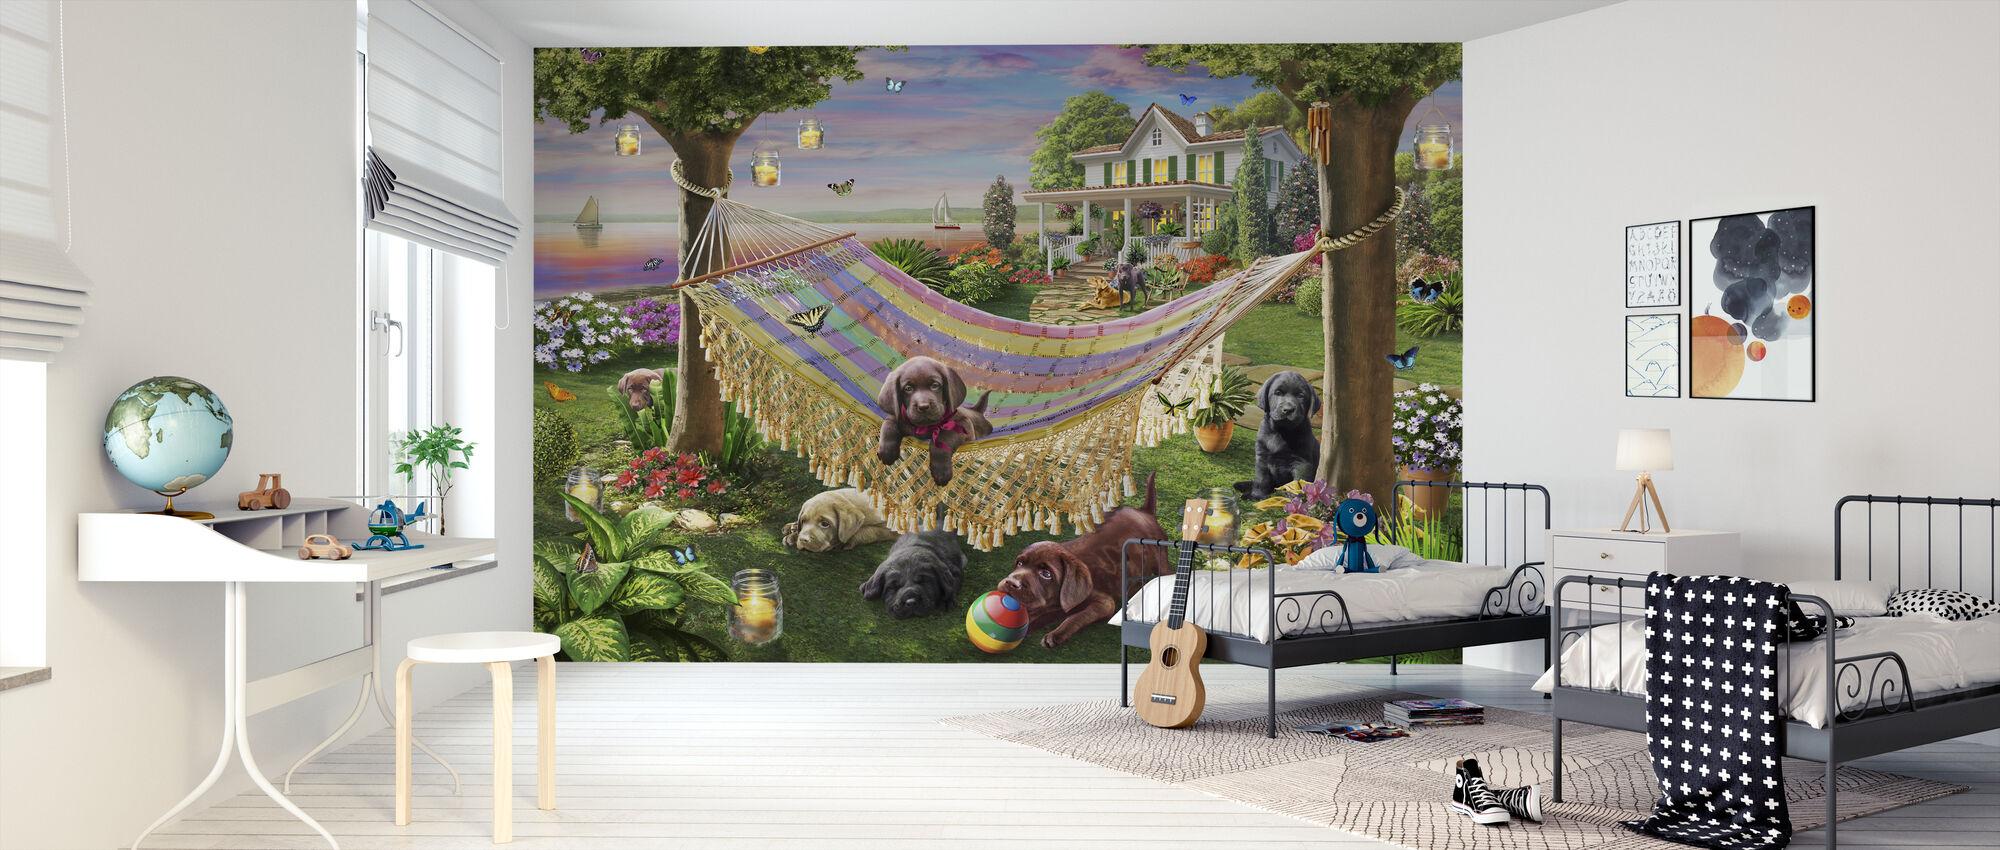 Puppies And Butterflies - Wallpaper - Kids Room